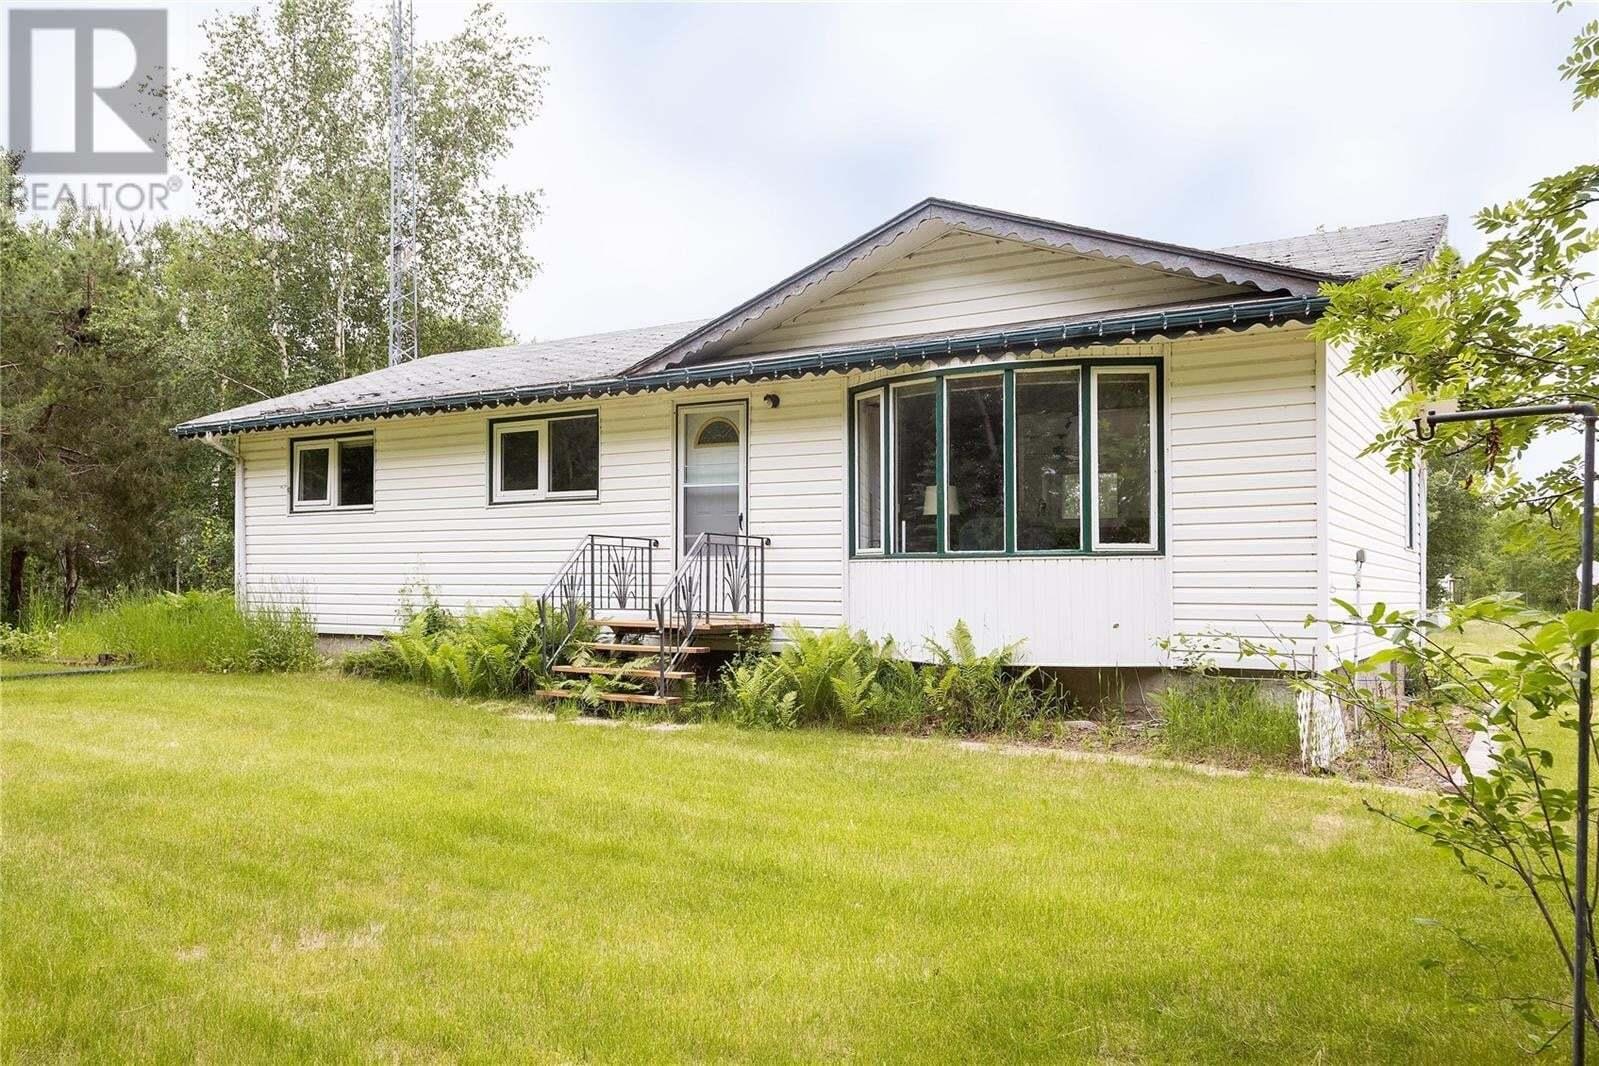 House for sale at Acreage, Honeymoon Rd Buckland Rm No. 491 Saskatchewan - MLS: SK814649